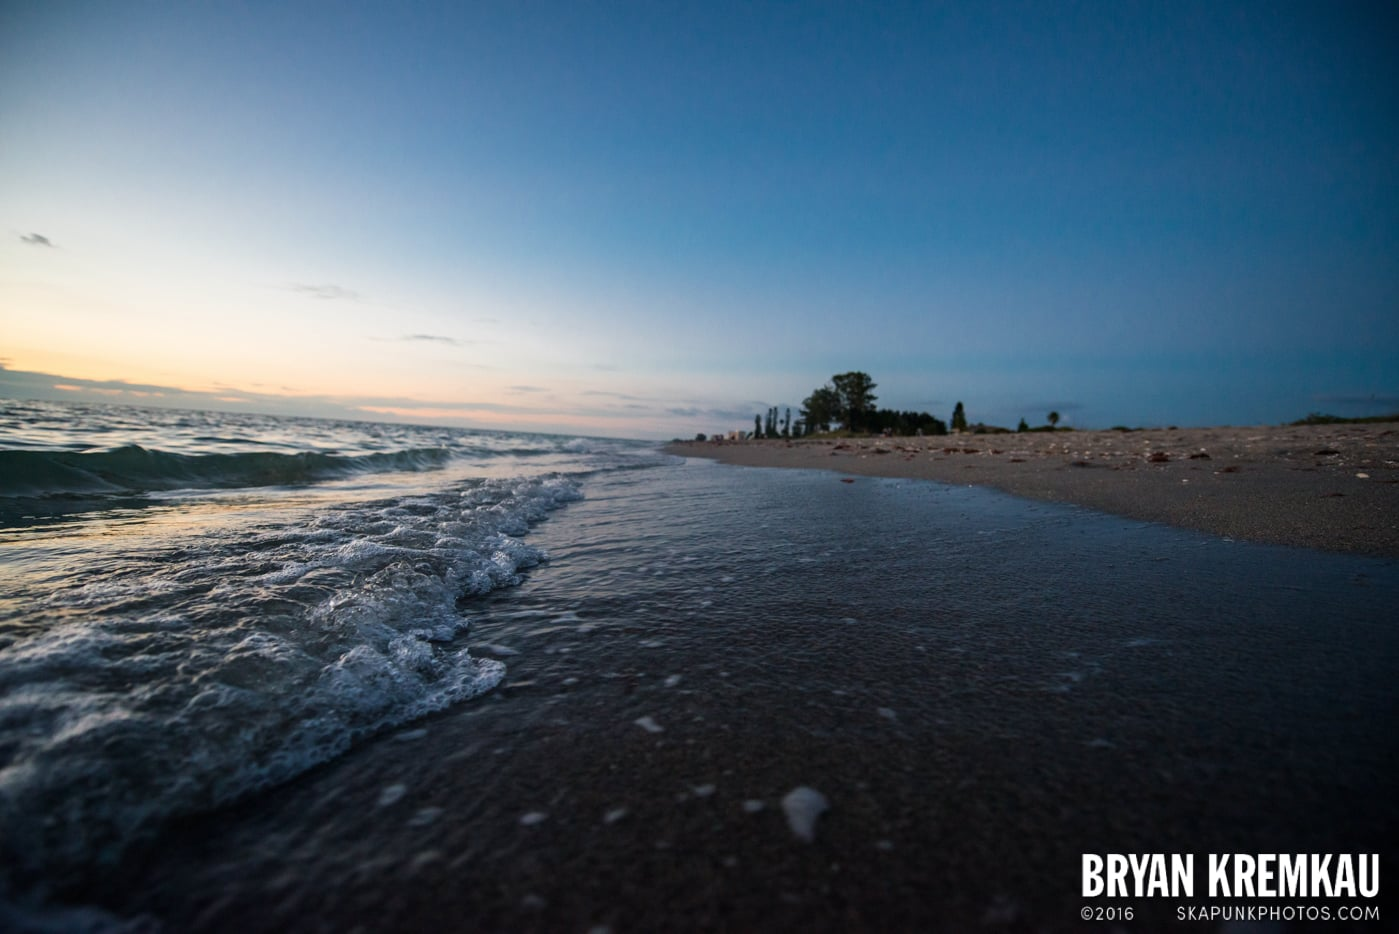 Sunsets, Astrophotography & Birds @ Venice, Florida - 10.25.14 - 11.5.14 (108)